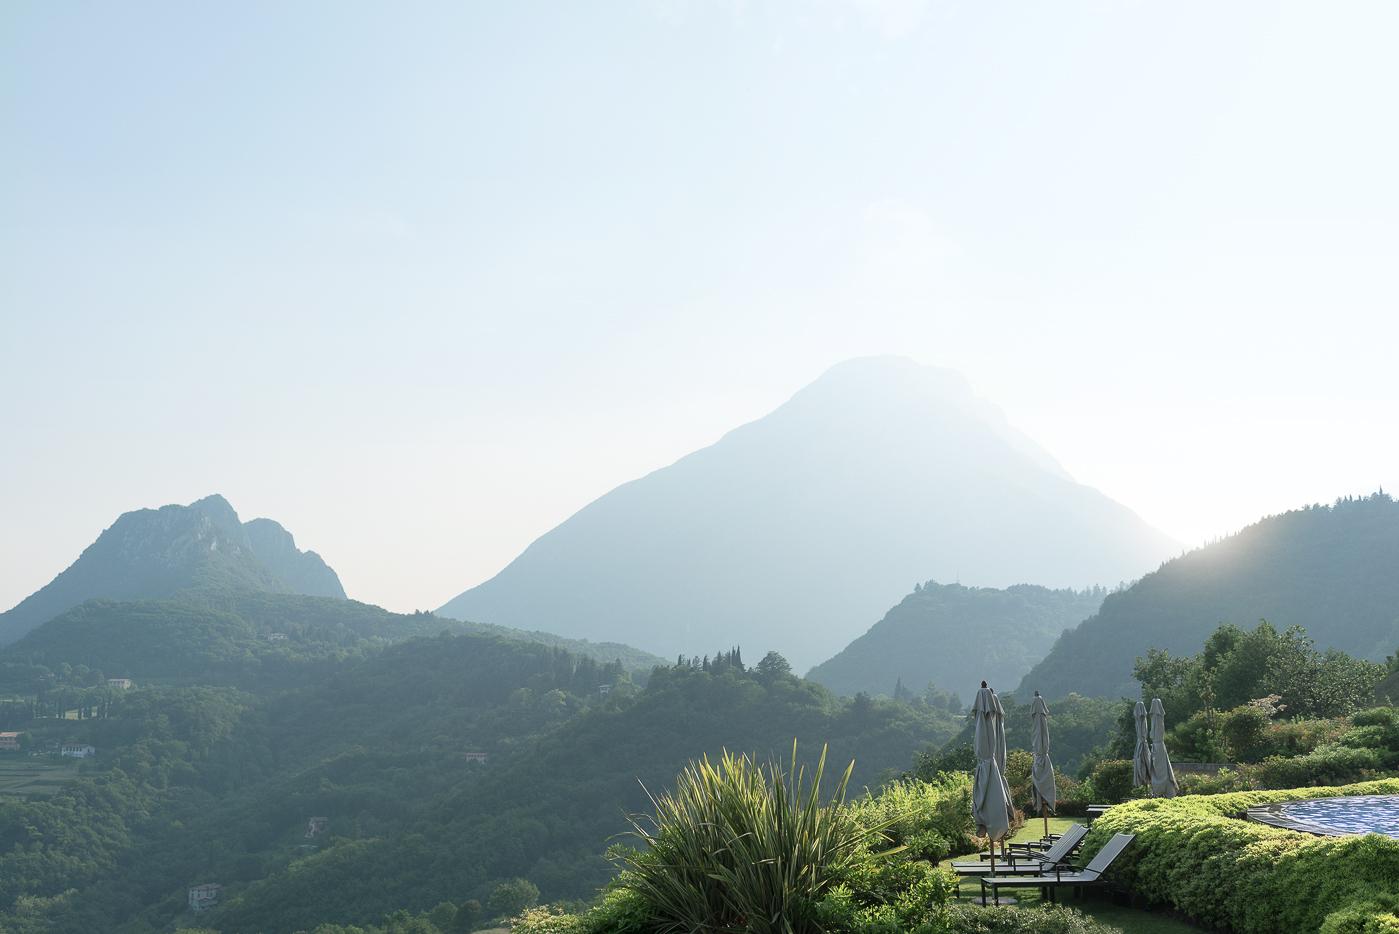 Maltherapie: Foto vom Wellnesshotel Lefay Resort & SPA Lago di Garda | Wellness Gardasee